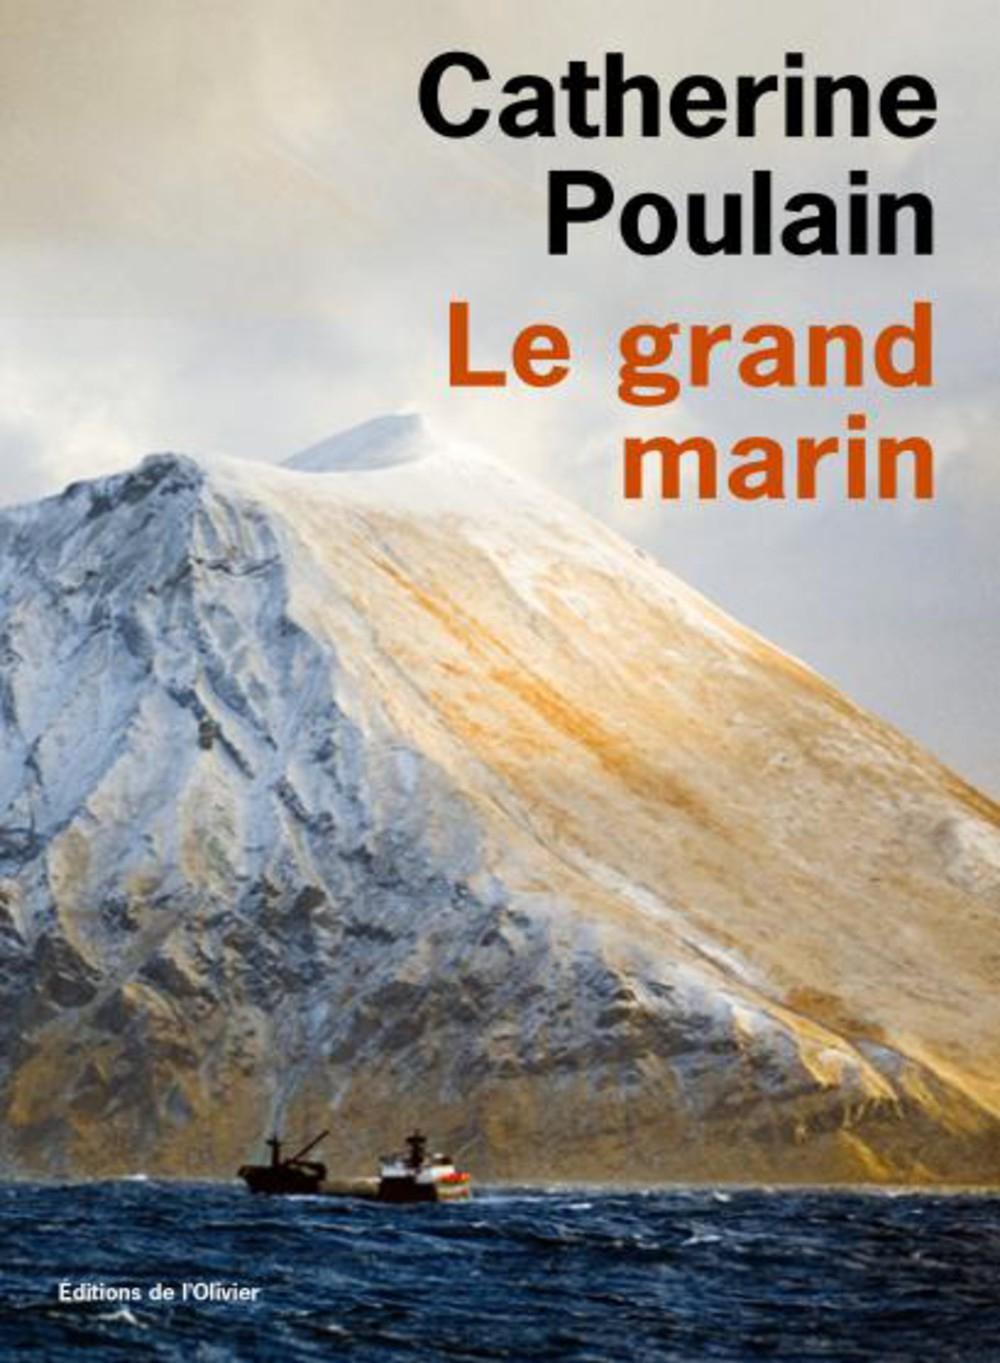 Le_grand_marin.jpg